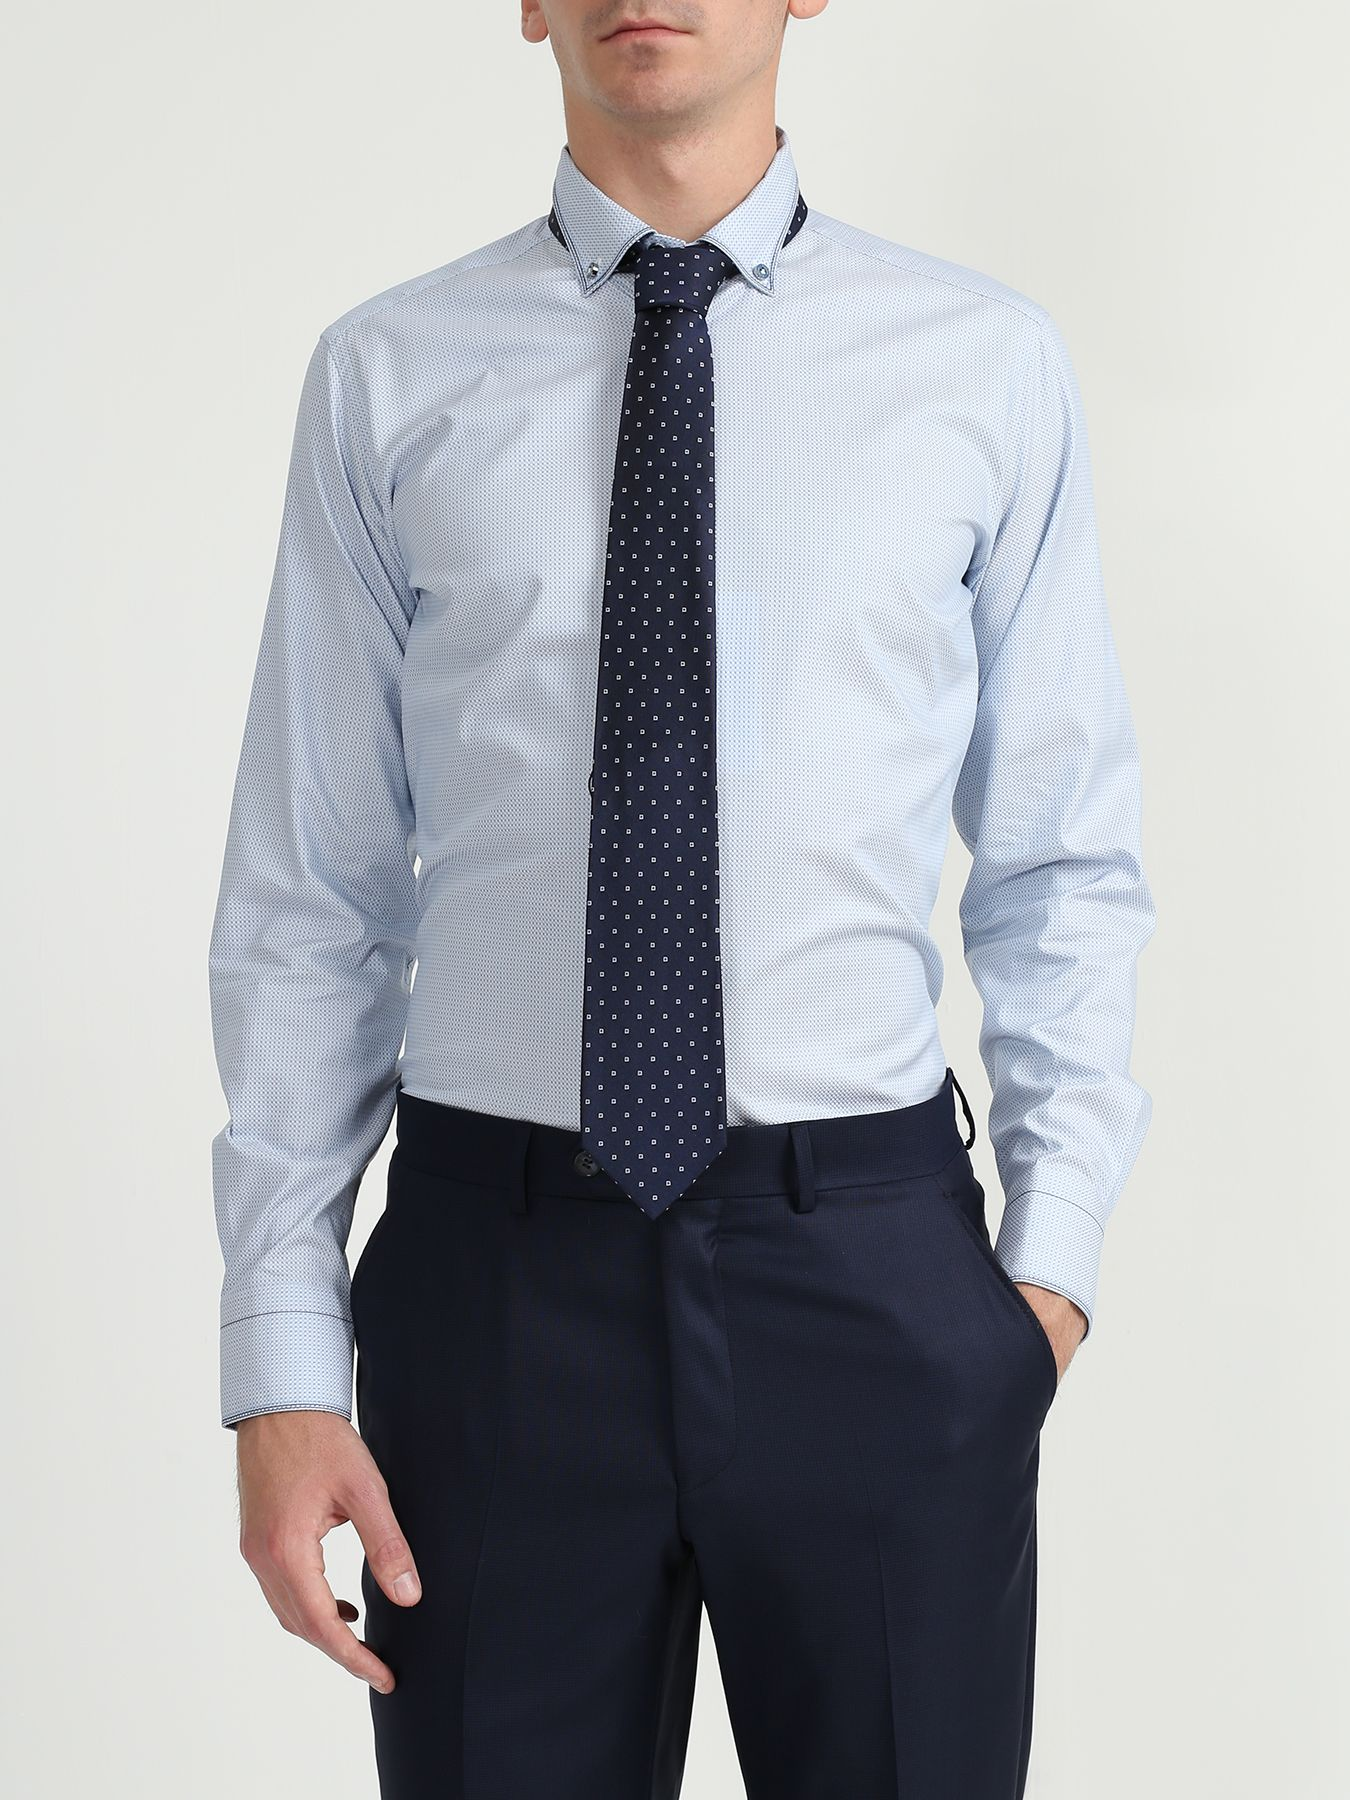 Alessandro Manzoni Шелковый галстук с узорами 324185-185